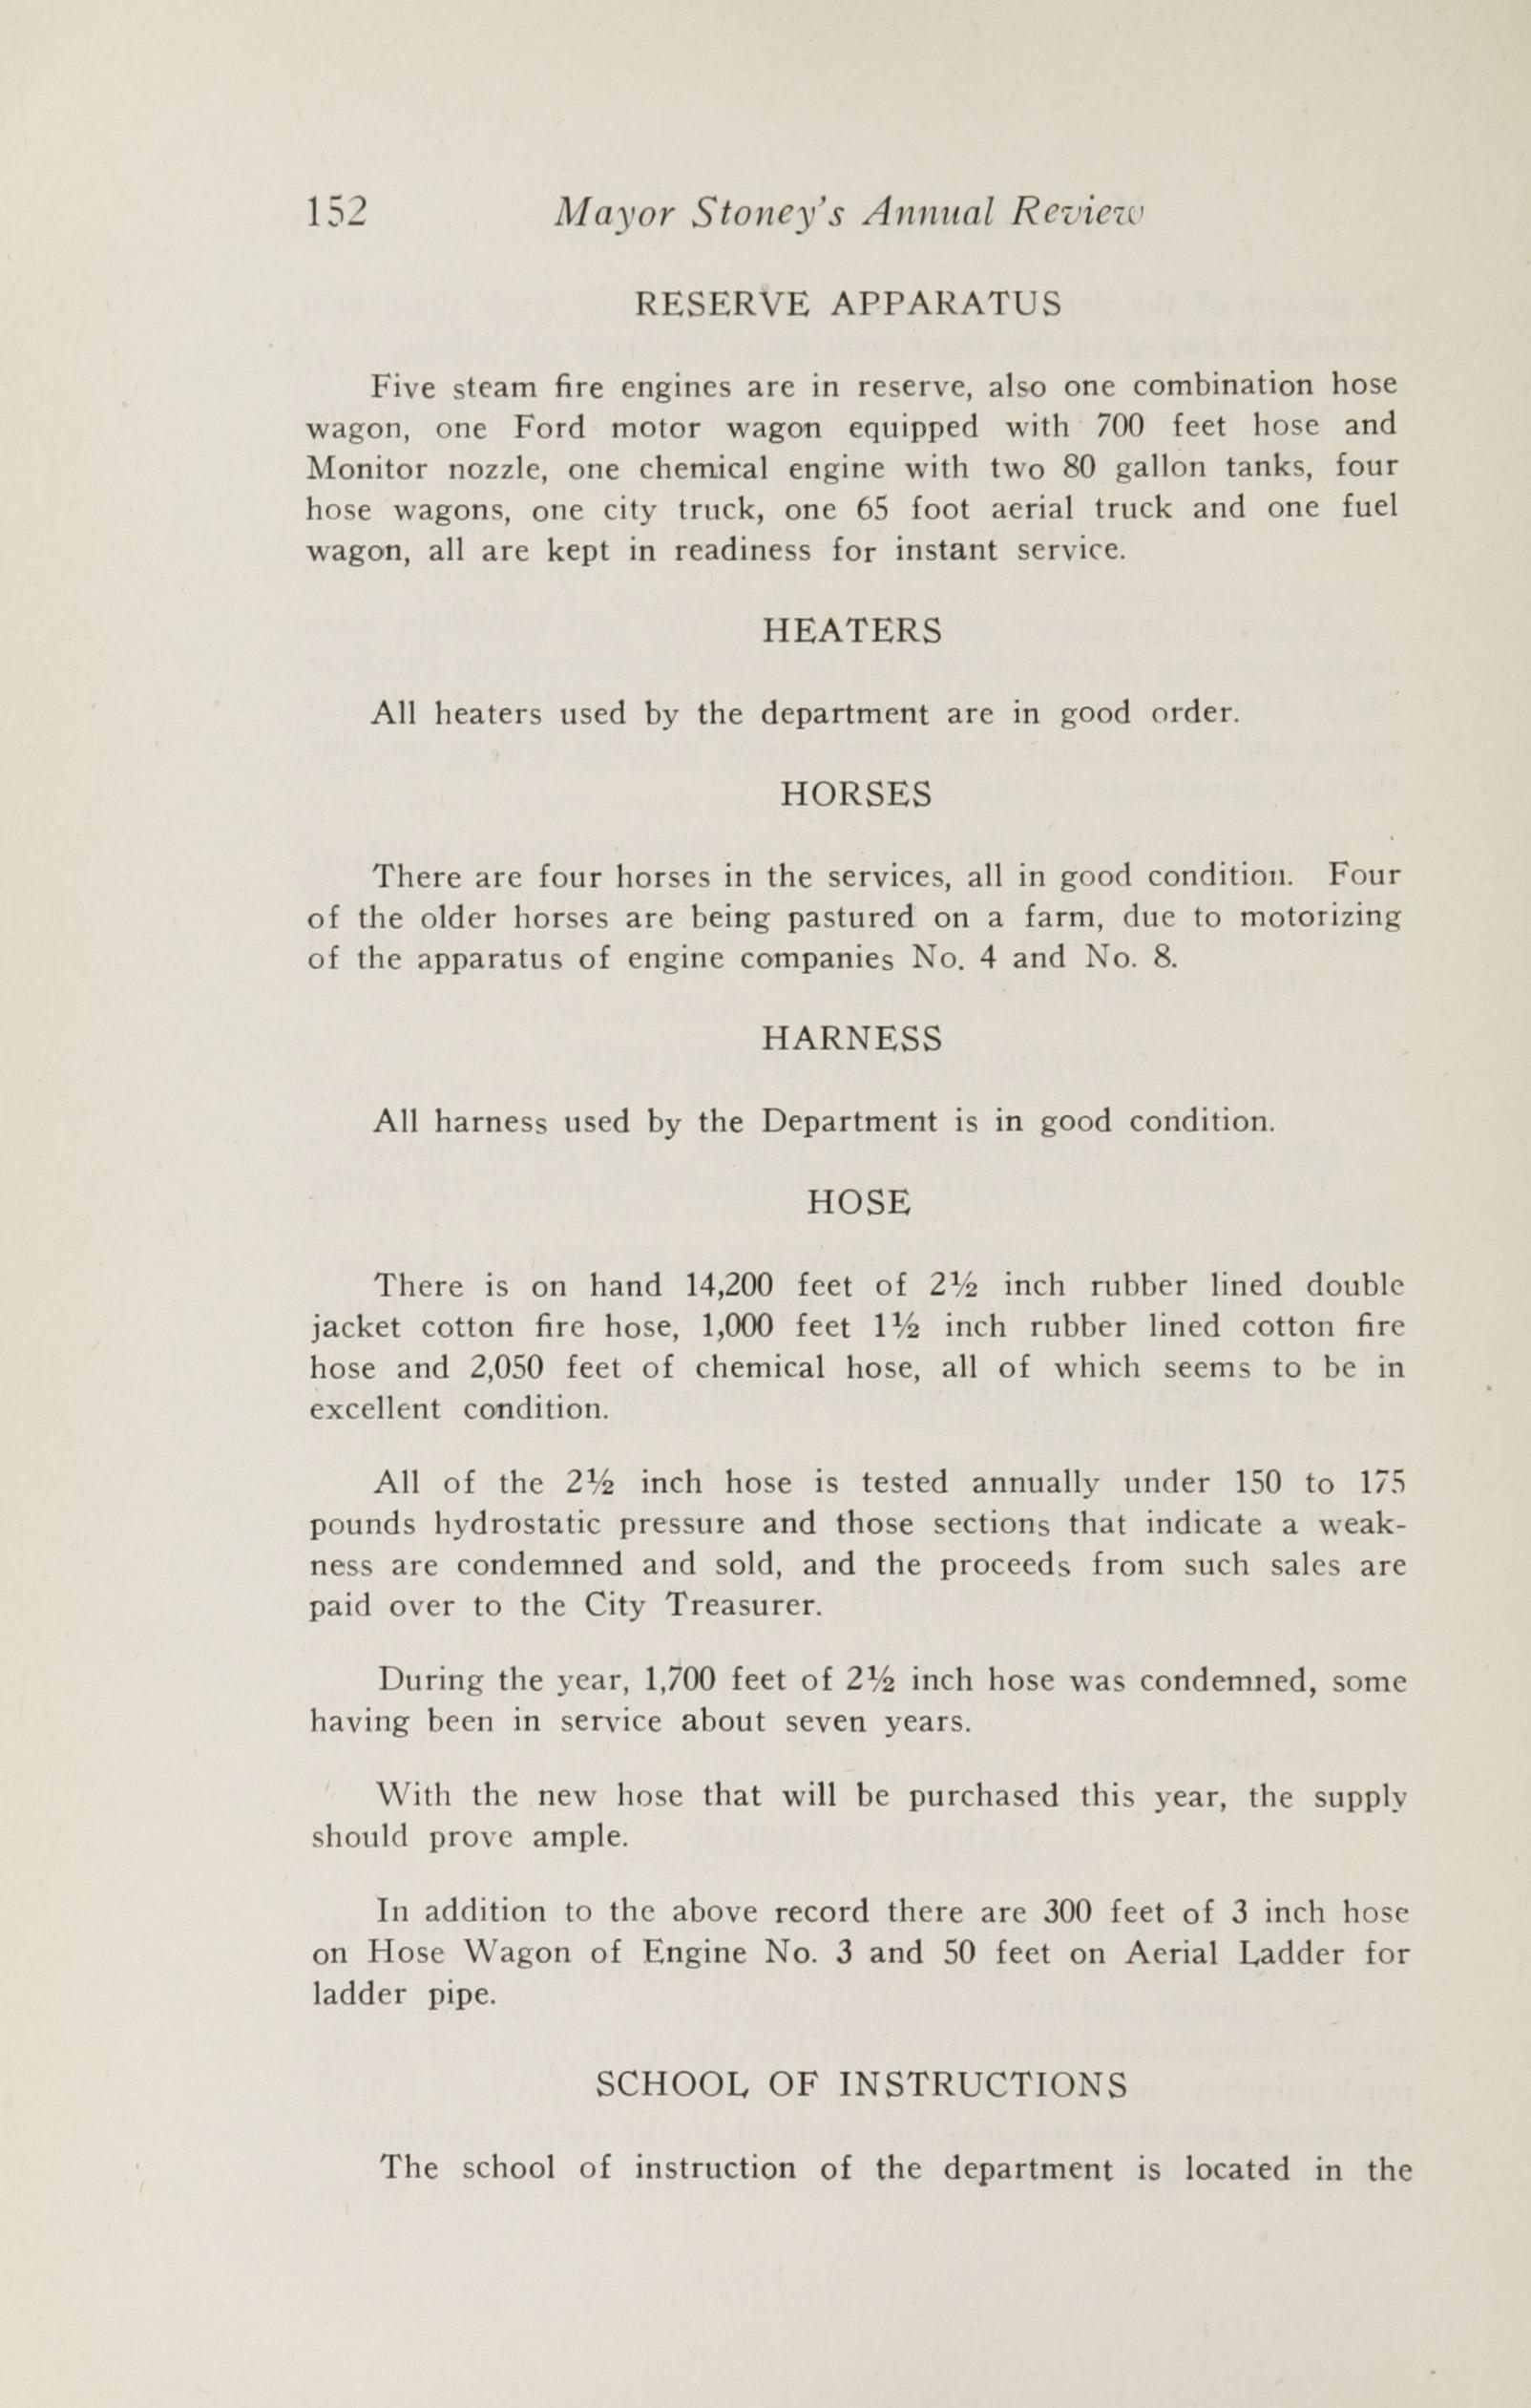 Charleston Yearbook, 1927, page 152